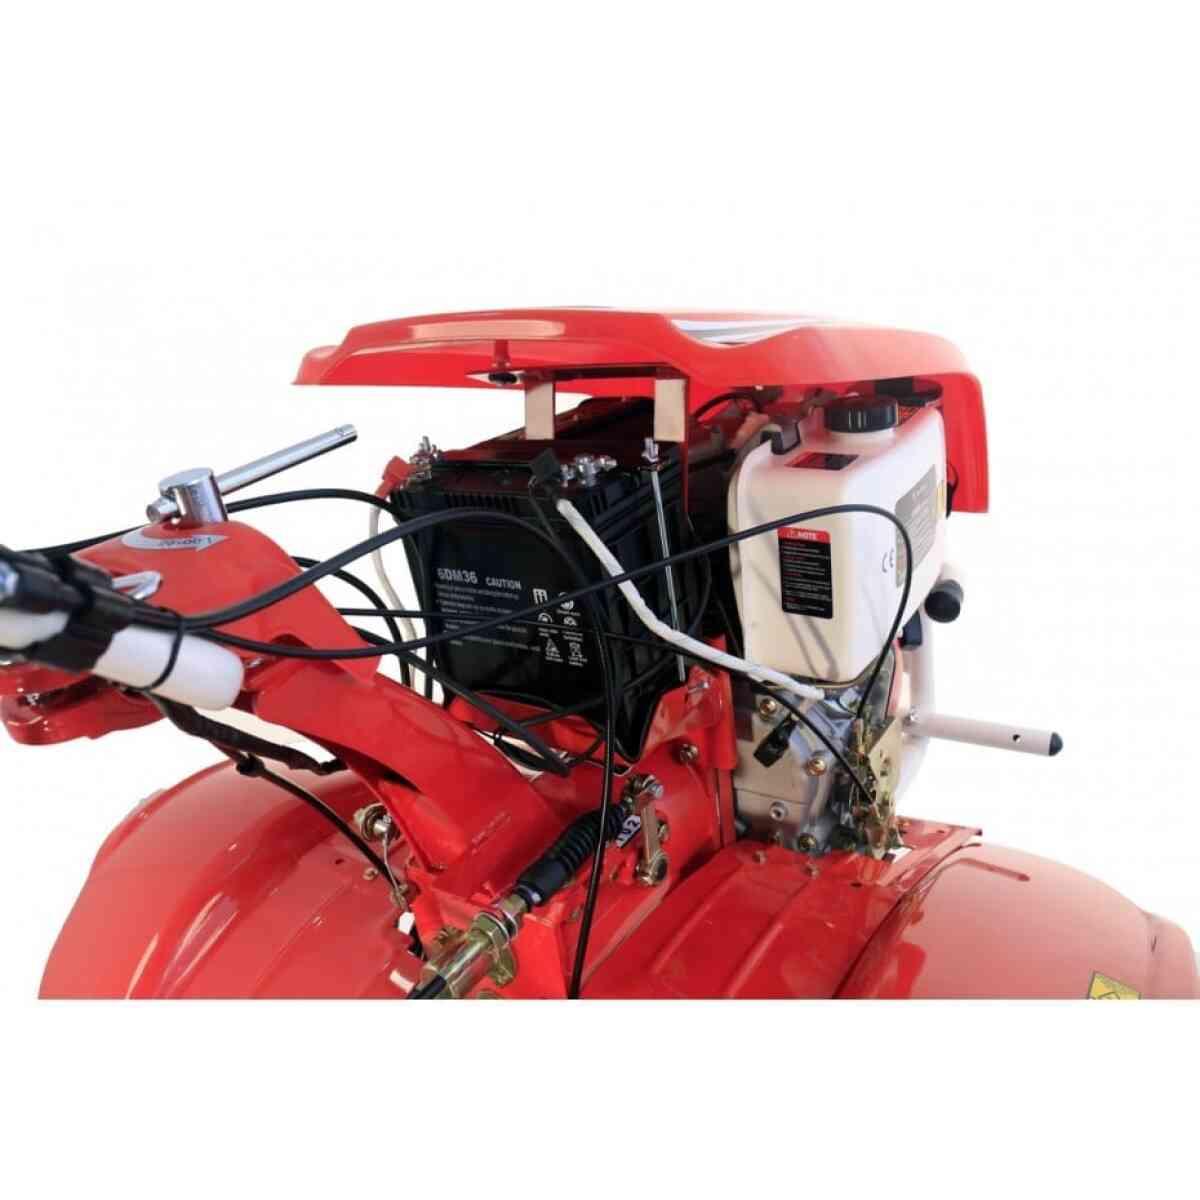 motocultor pro series new 1350 s o mac.ro 6 1 27